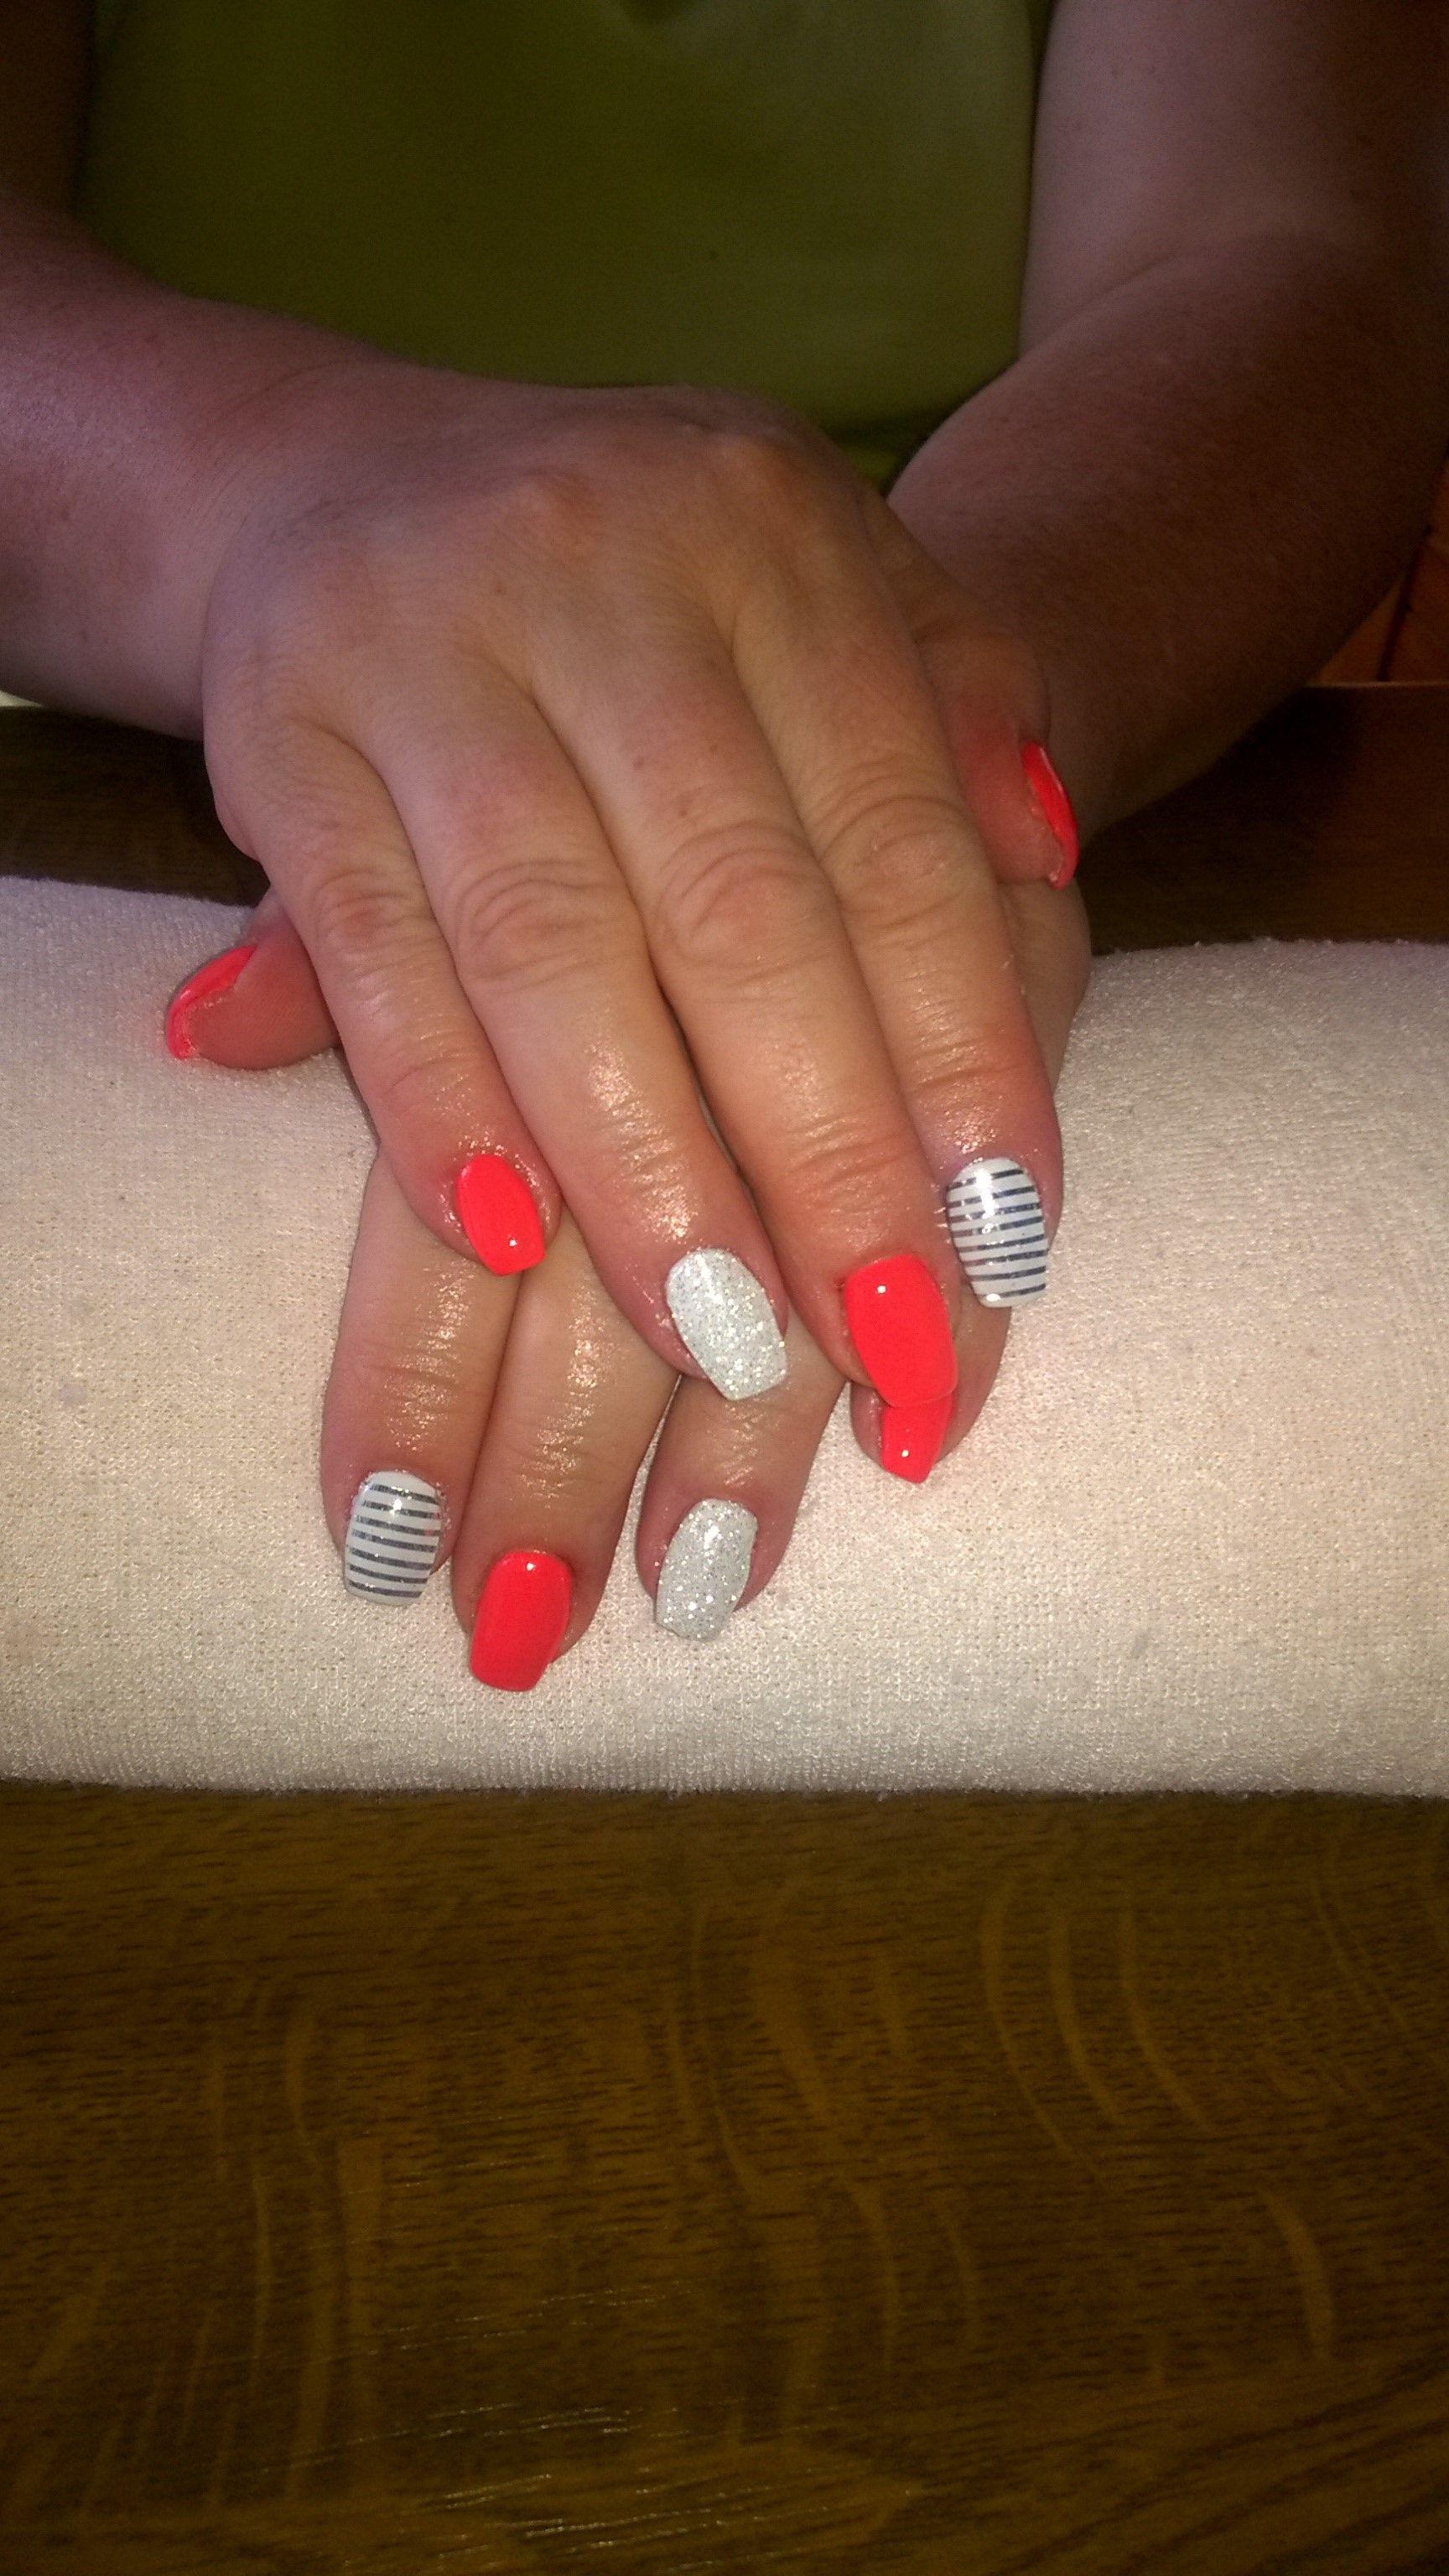 neon orange gel, white glitter and silver stripes